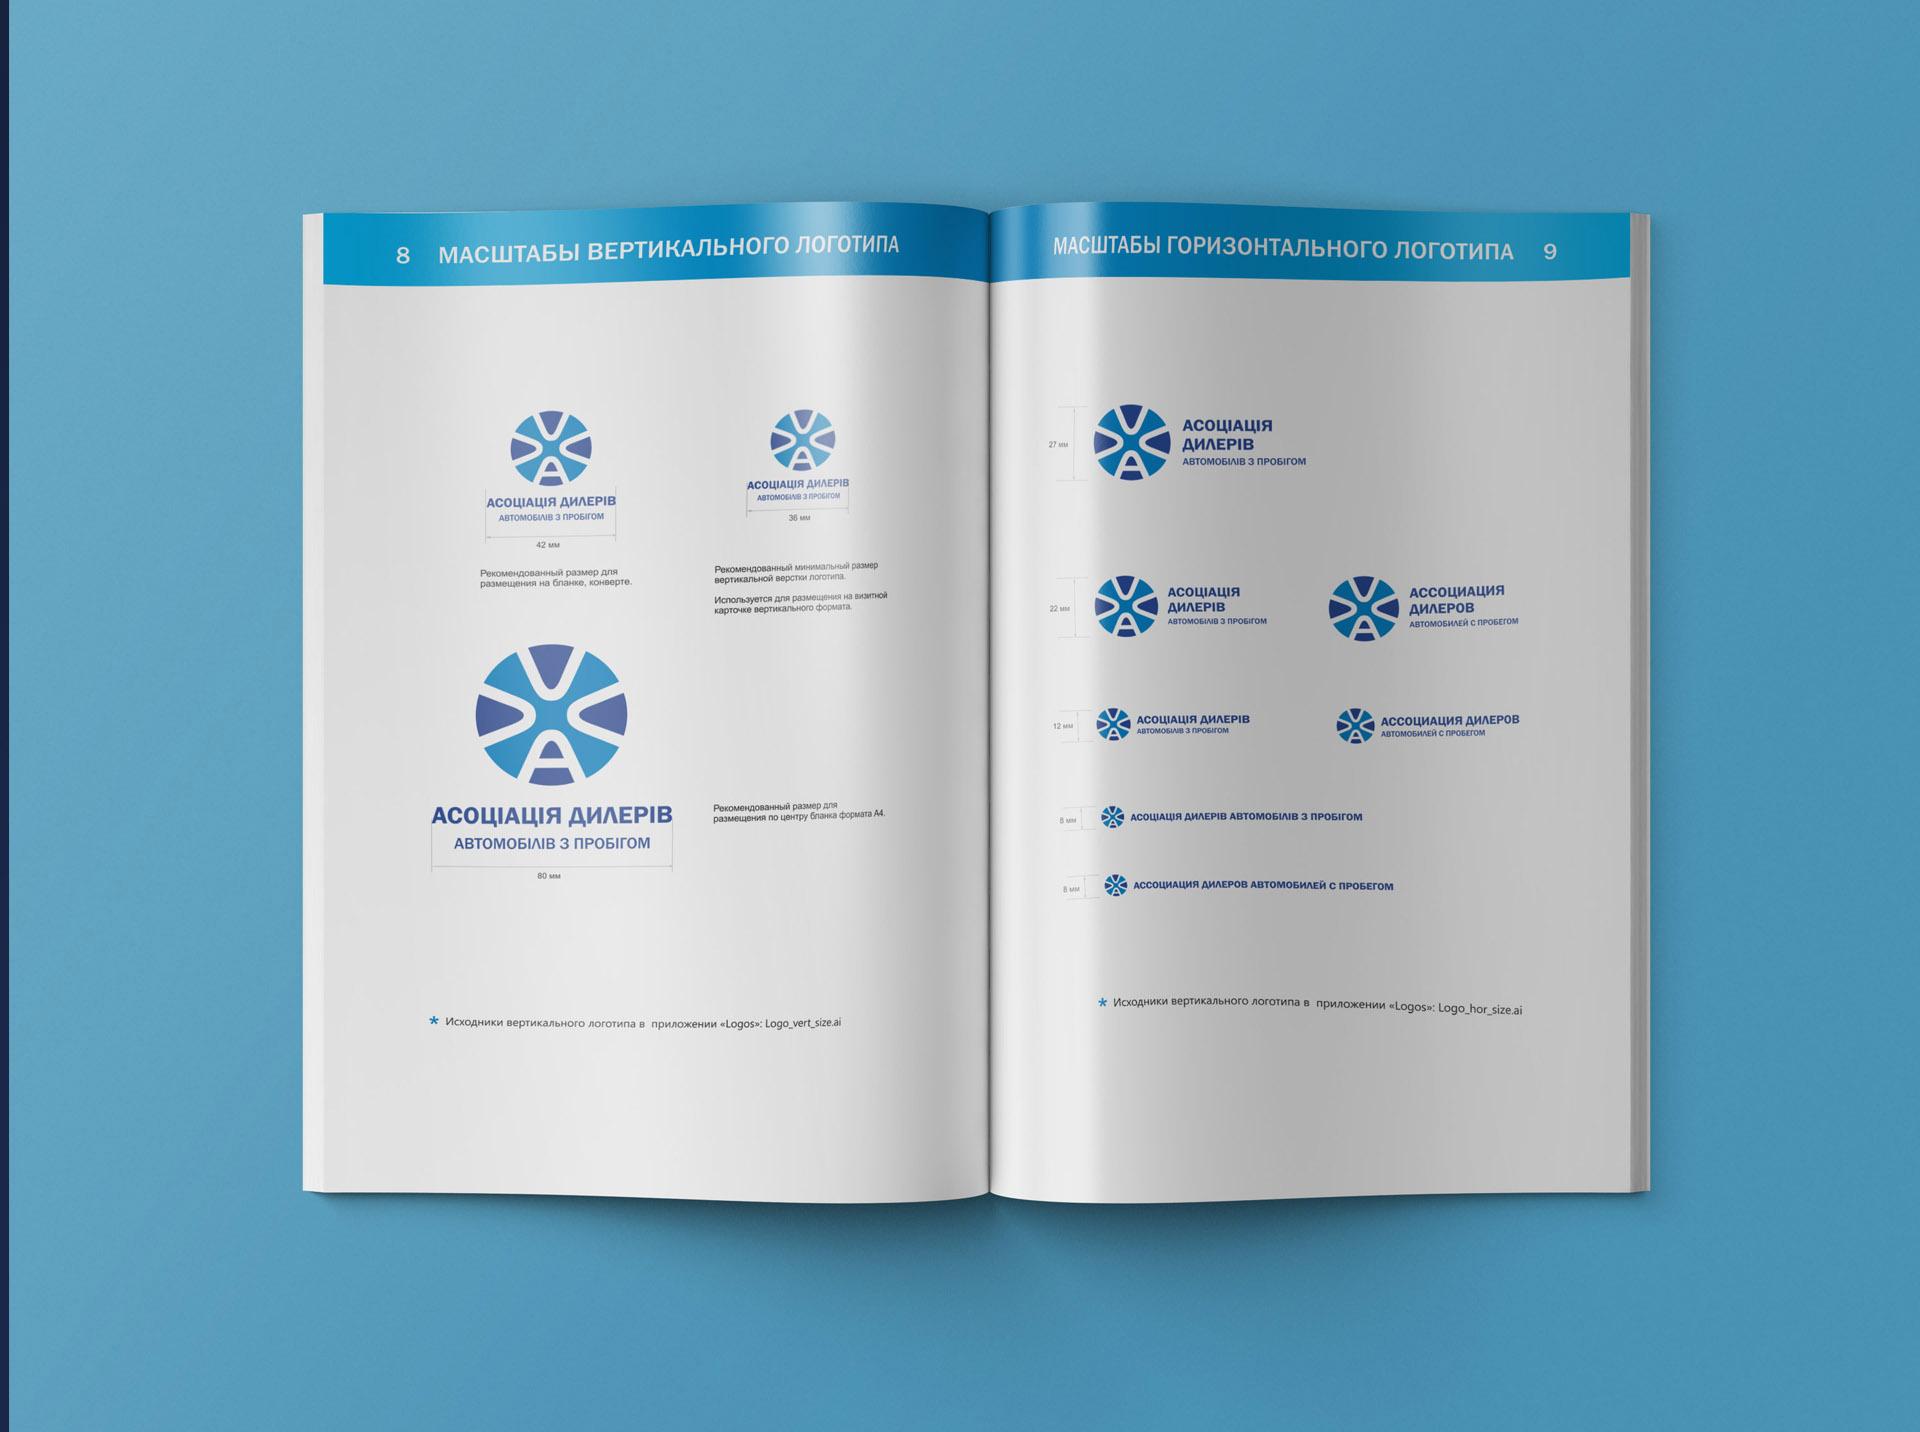 Development of the corporate identity консалтинговой компании